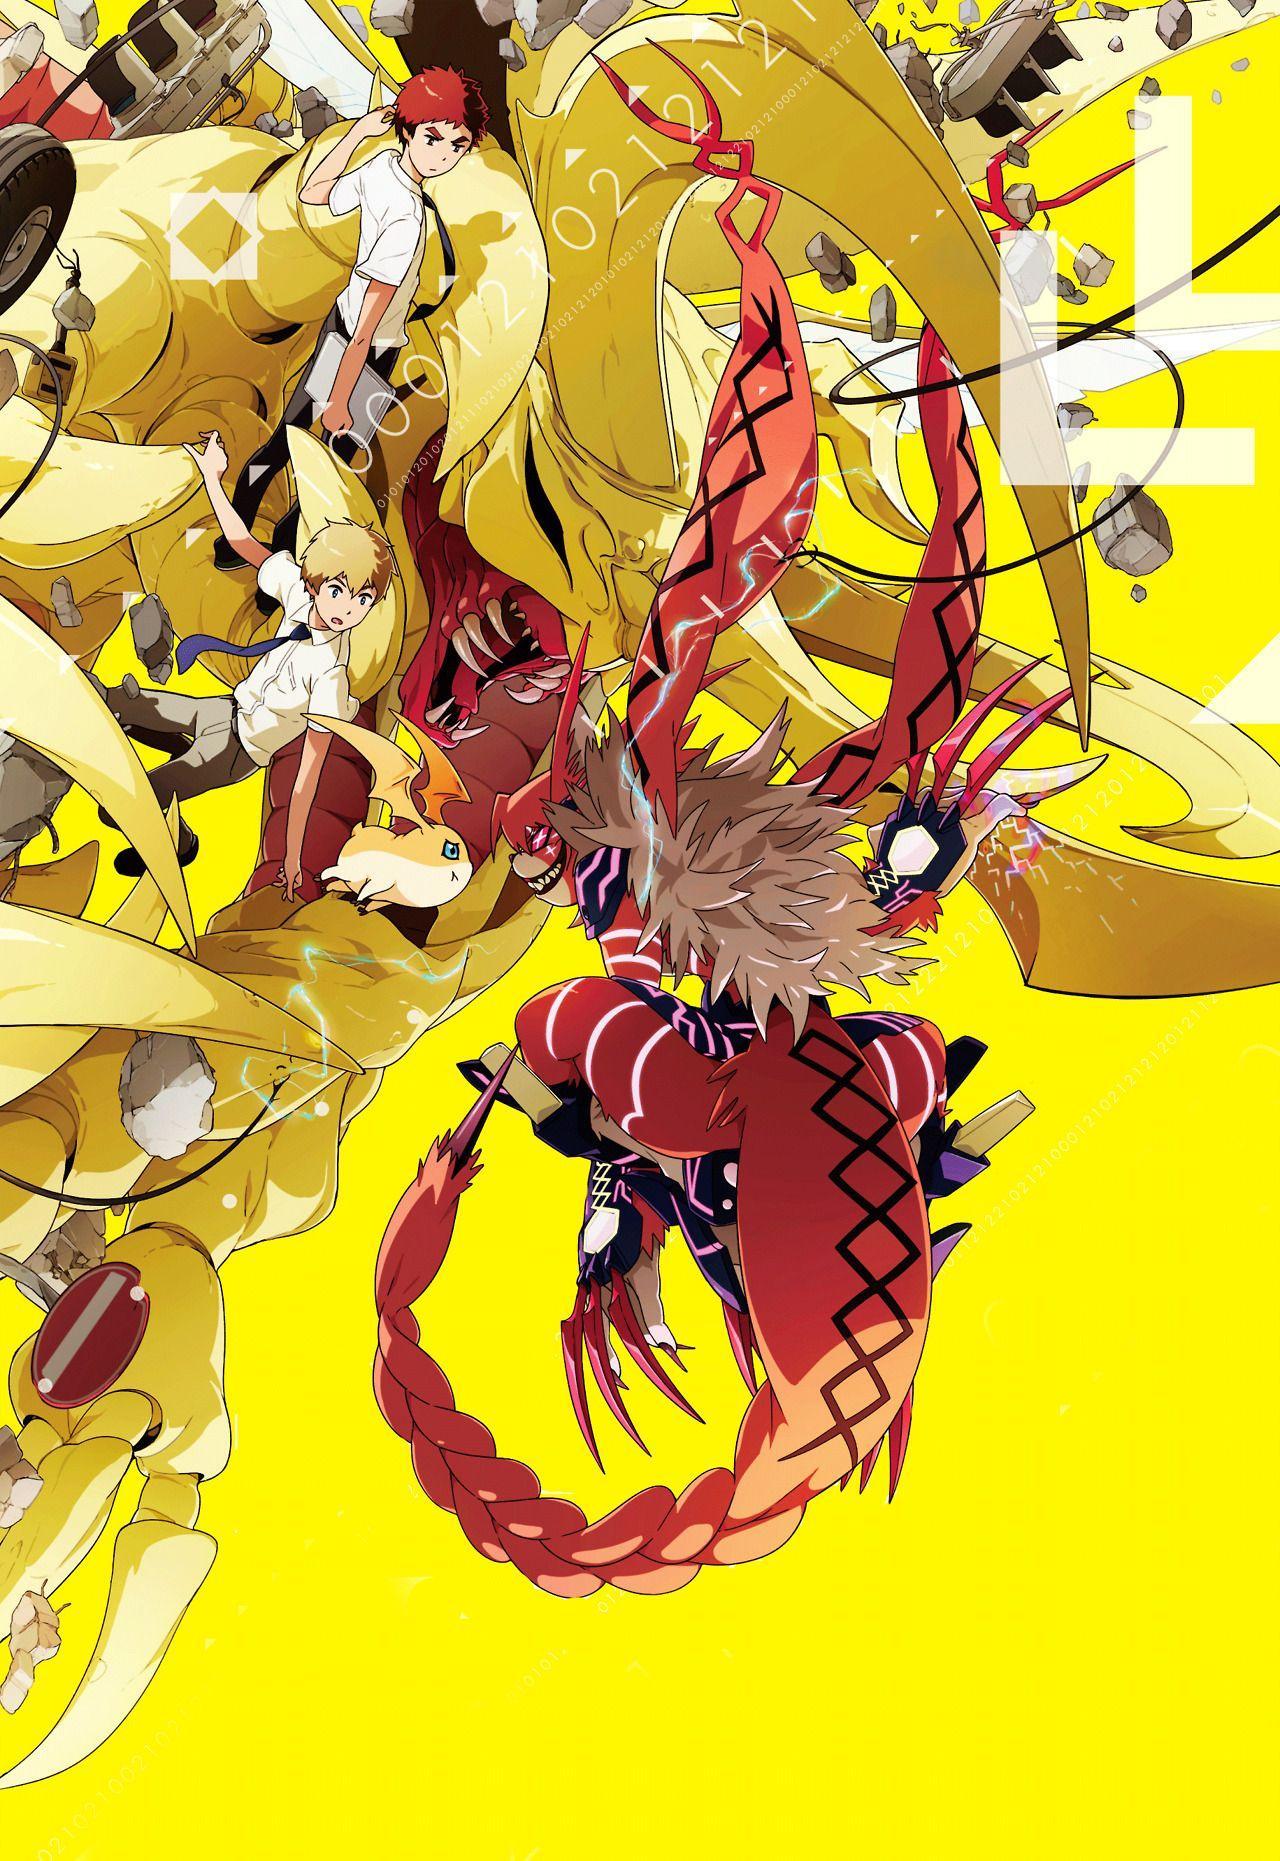 Digimon Phone Wallpapers Top Free Digimon Phone